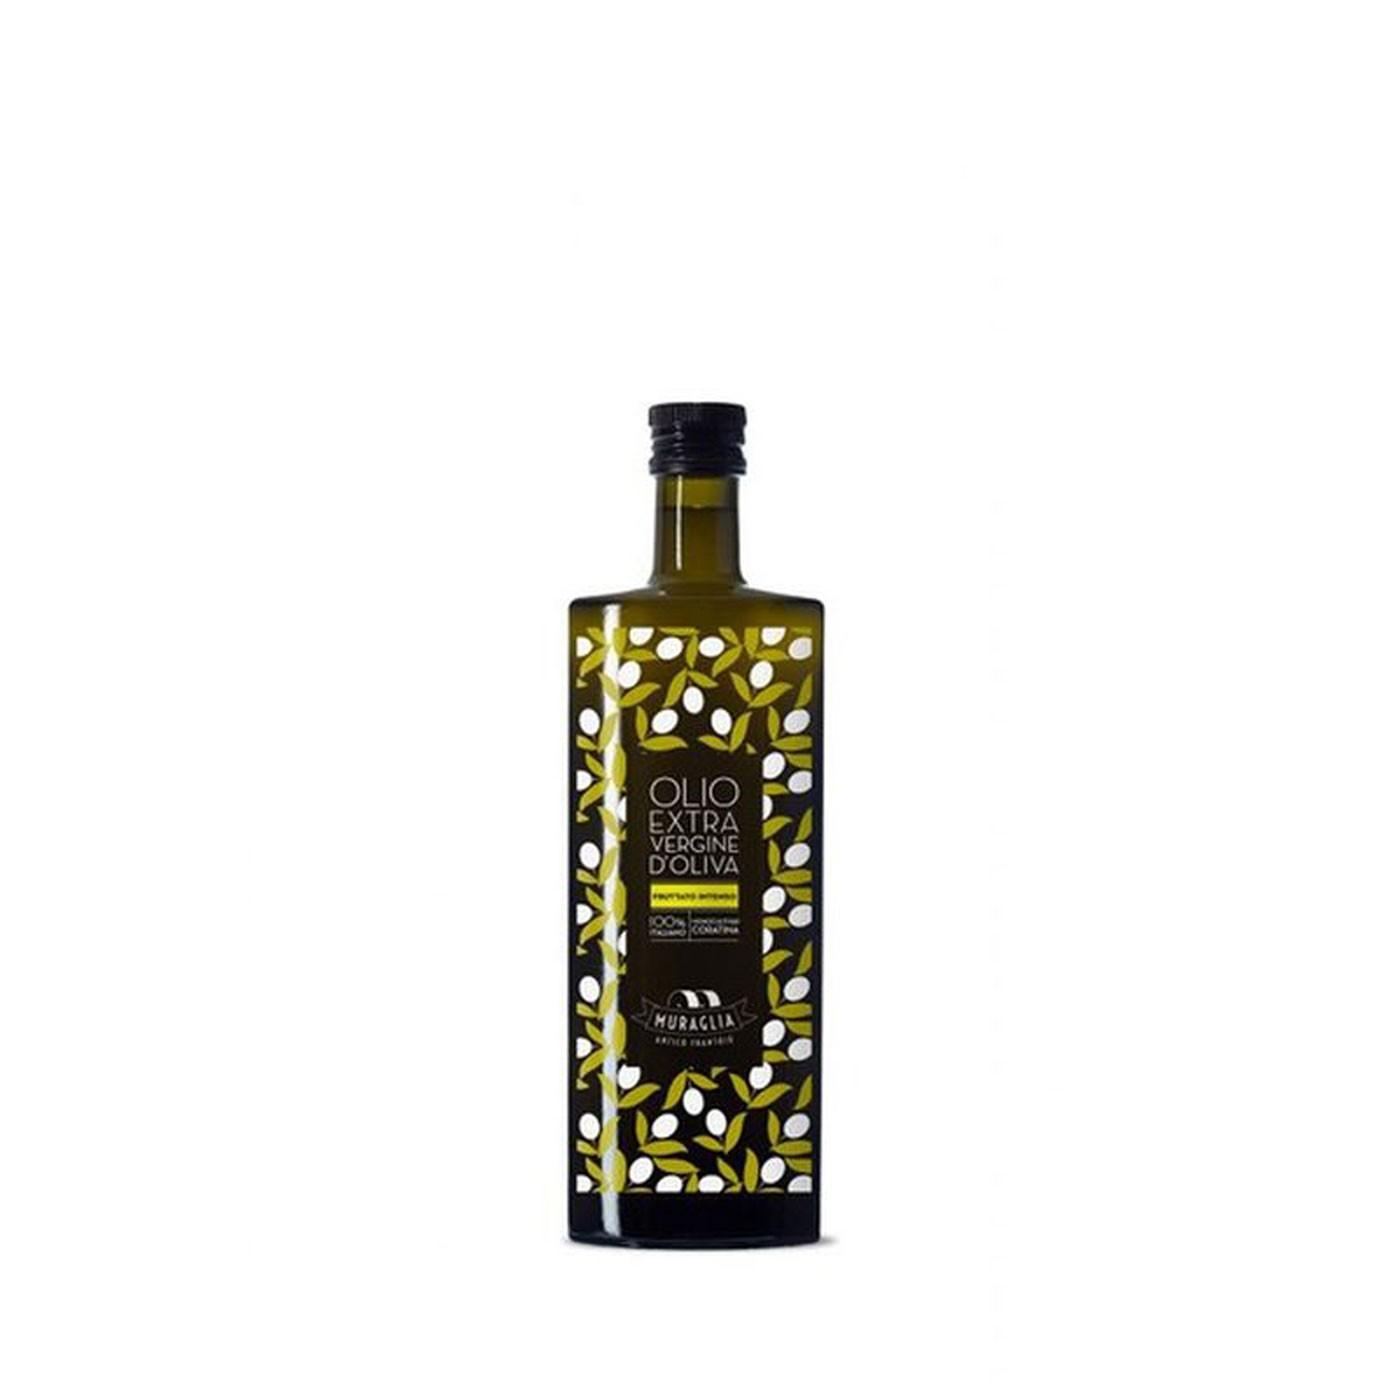 Essence Medium Extra Virgin Olive Oil 16.91 oz